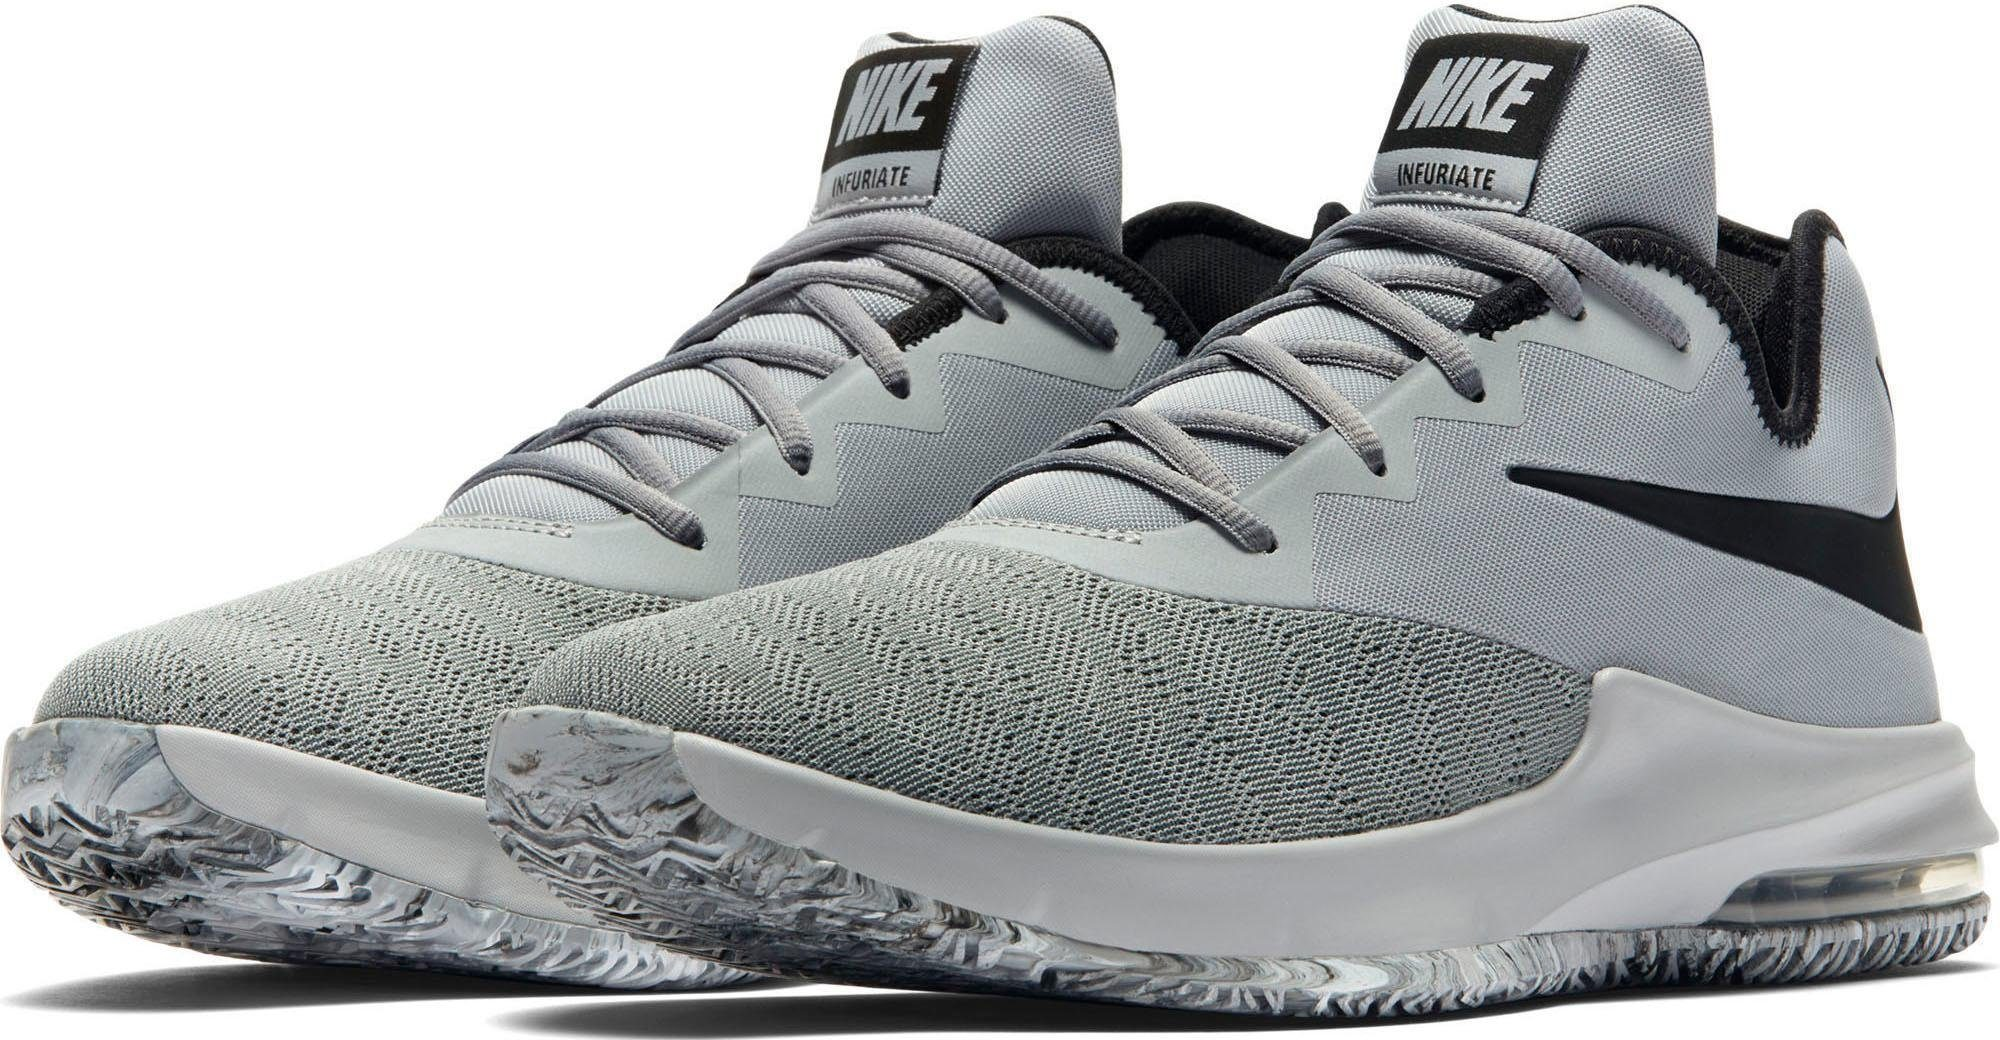 Nike Air Max Infuriate III Low Men's Basketball Shoe. Nike VN